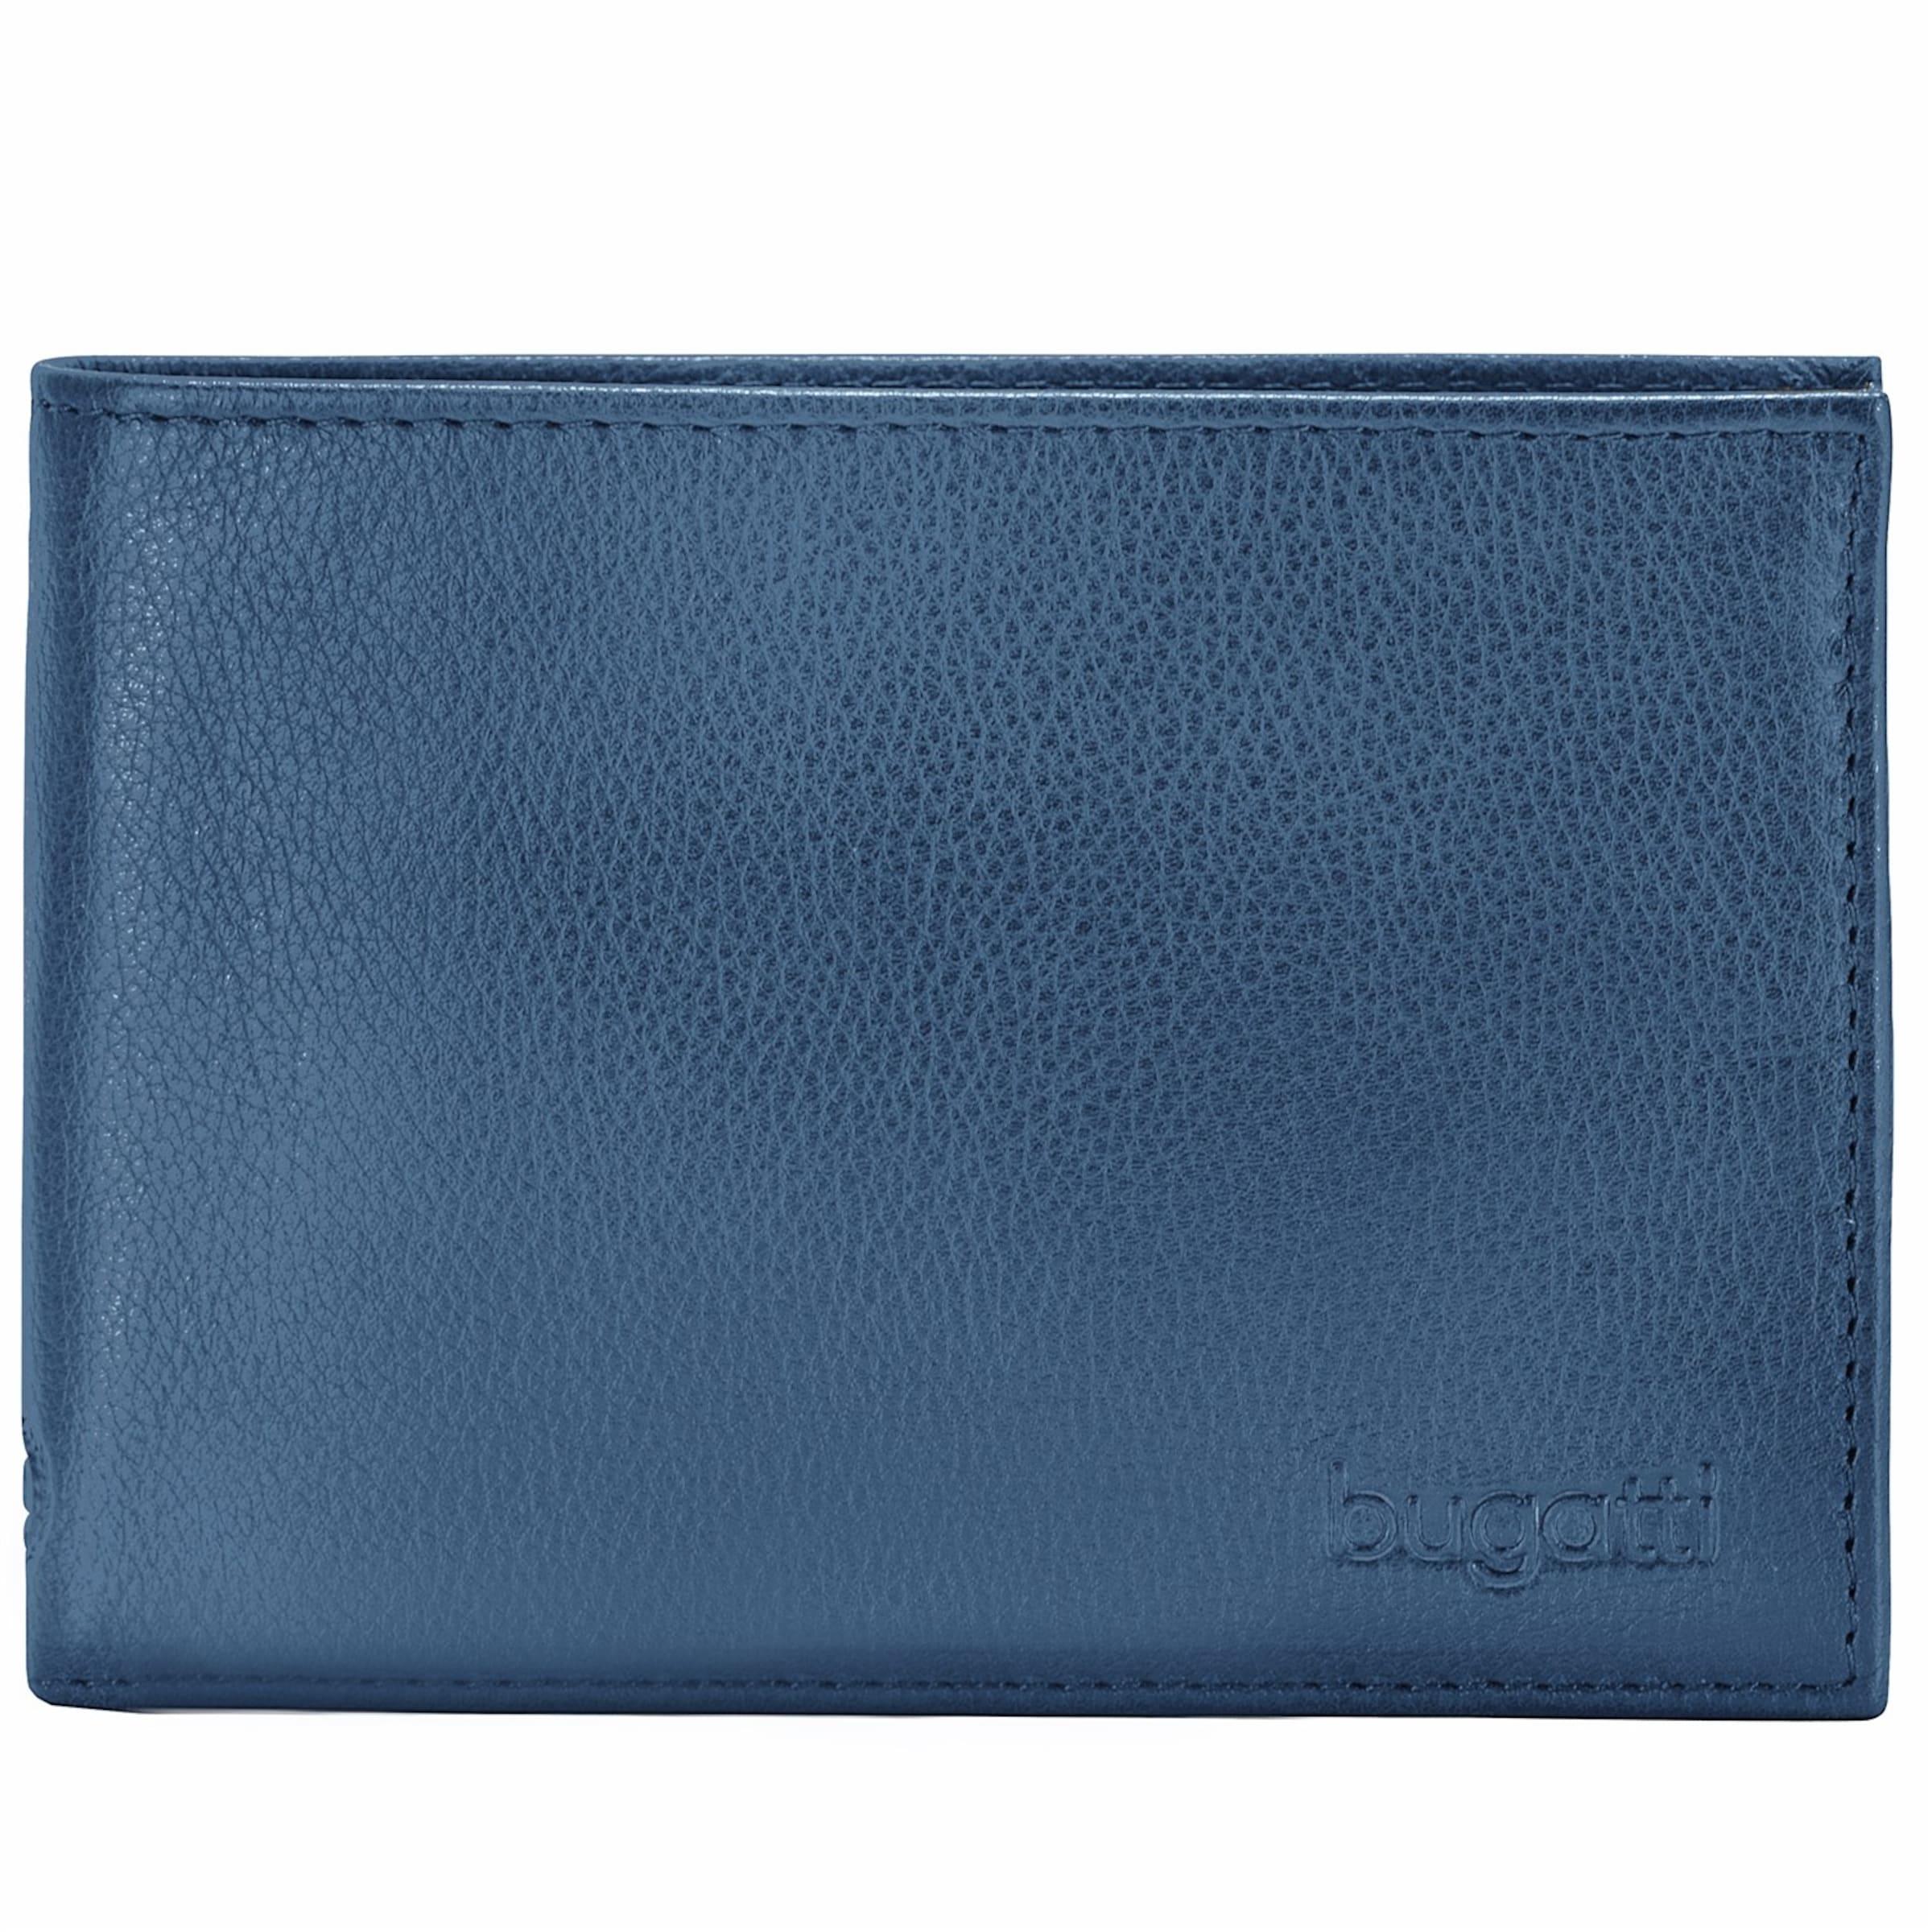 'sempre' Blau Bugatti Geldbörse In Bugatti ONn0Pk8wXZ